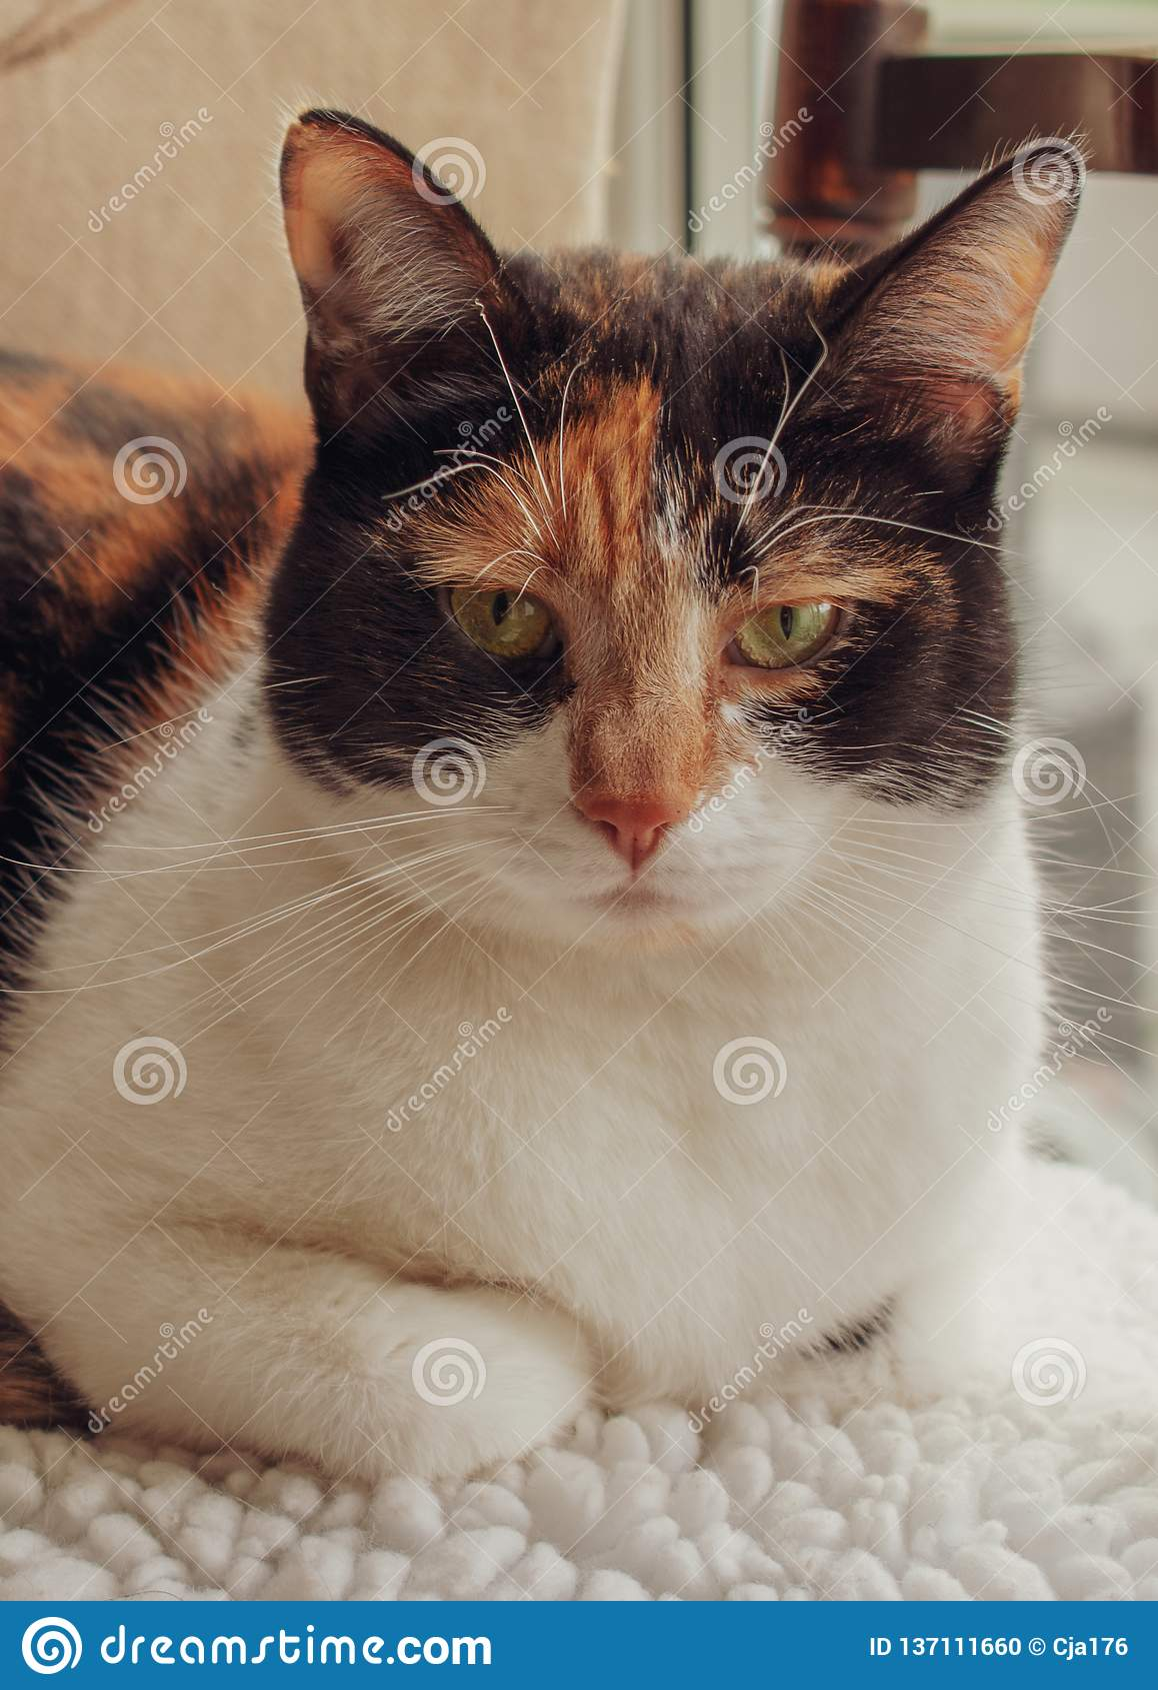 Tortoiseshell calico cat lying on kitchen chair